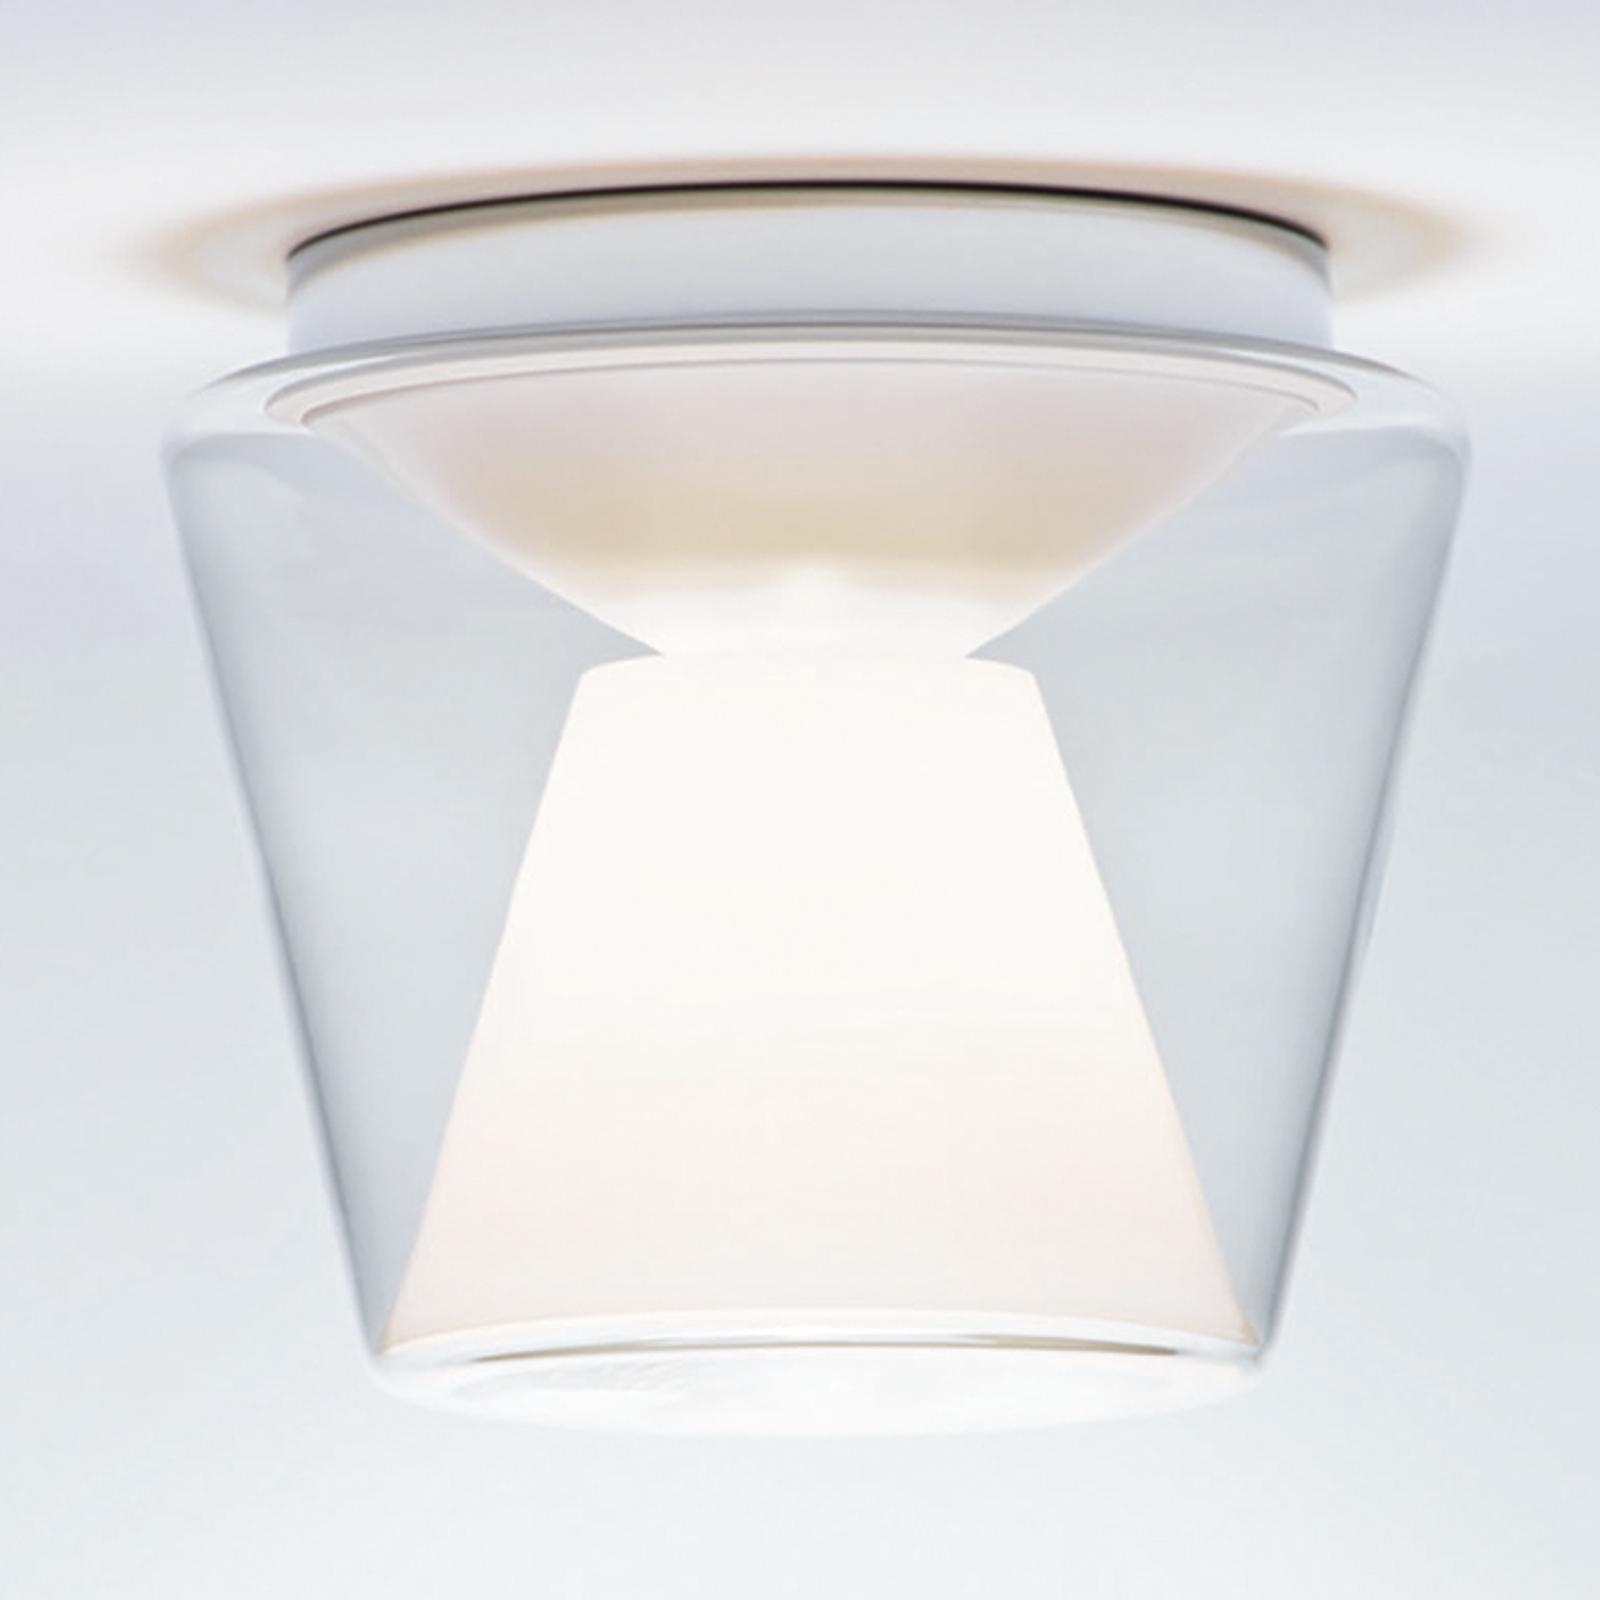 Suupuhallettu LED-design-kattovalaisin Annex